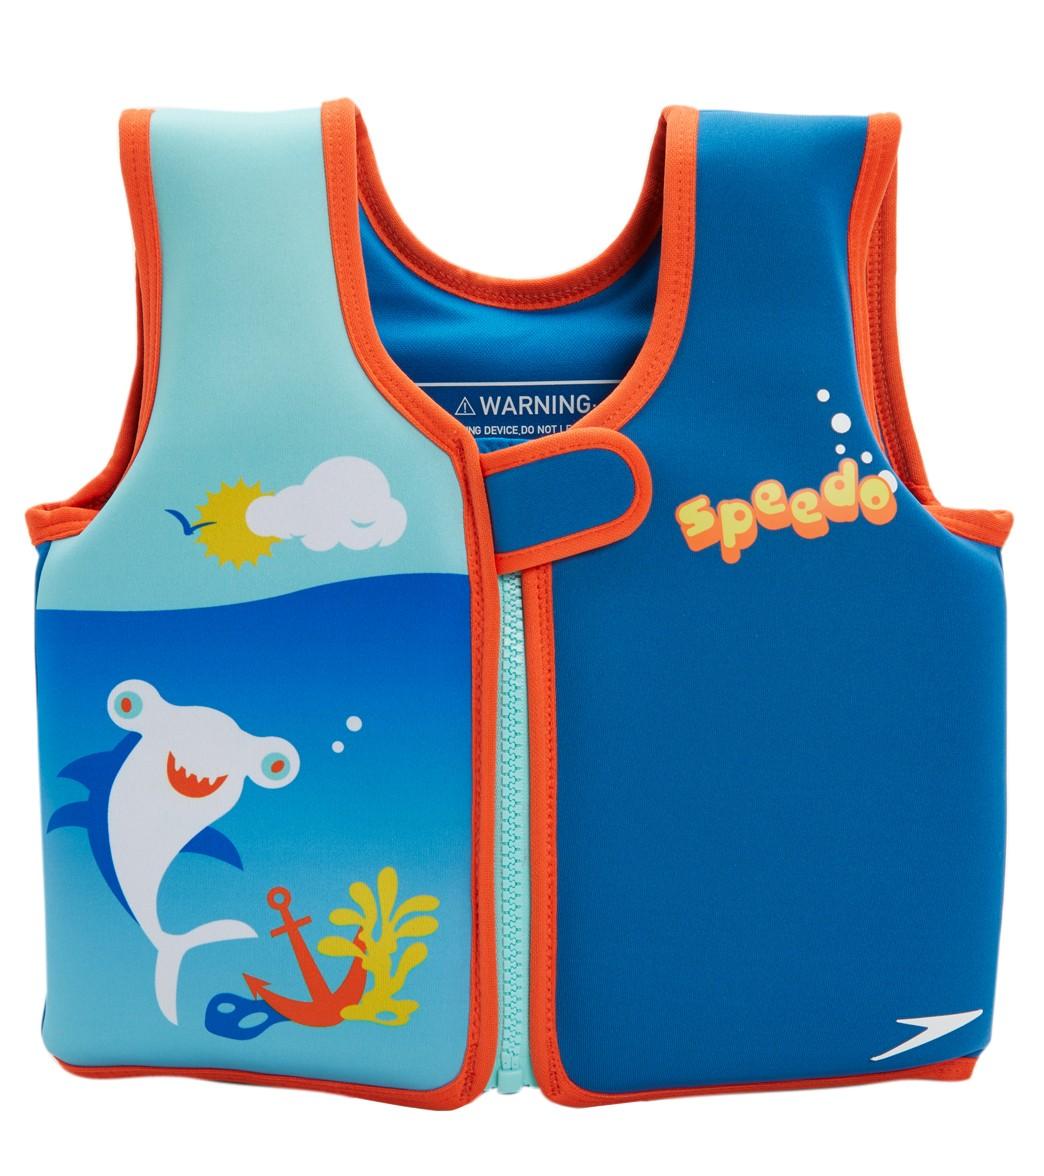 Sprint GLOVES Surfing Swimming Lane Training WATER AEROBIC Exercise Neoprene